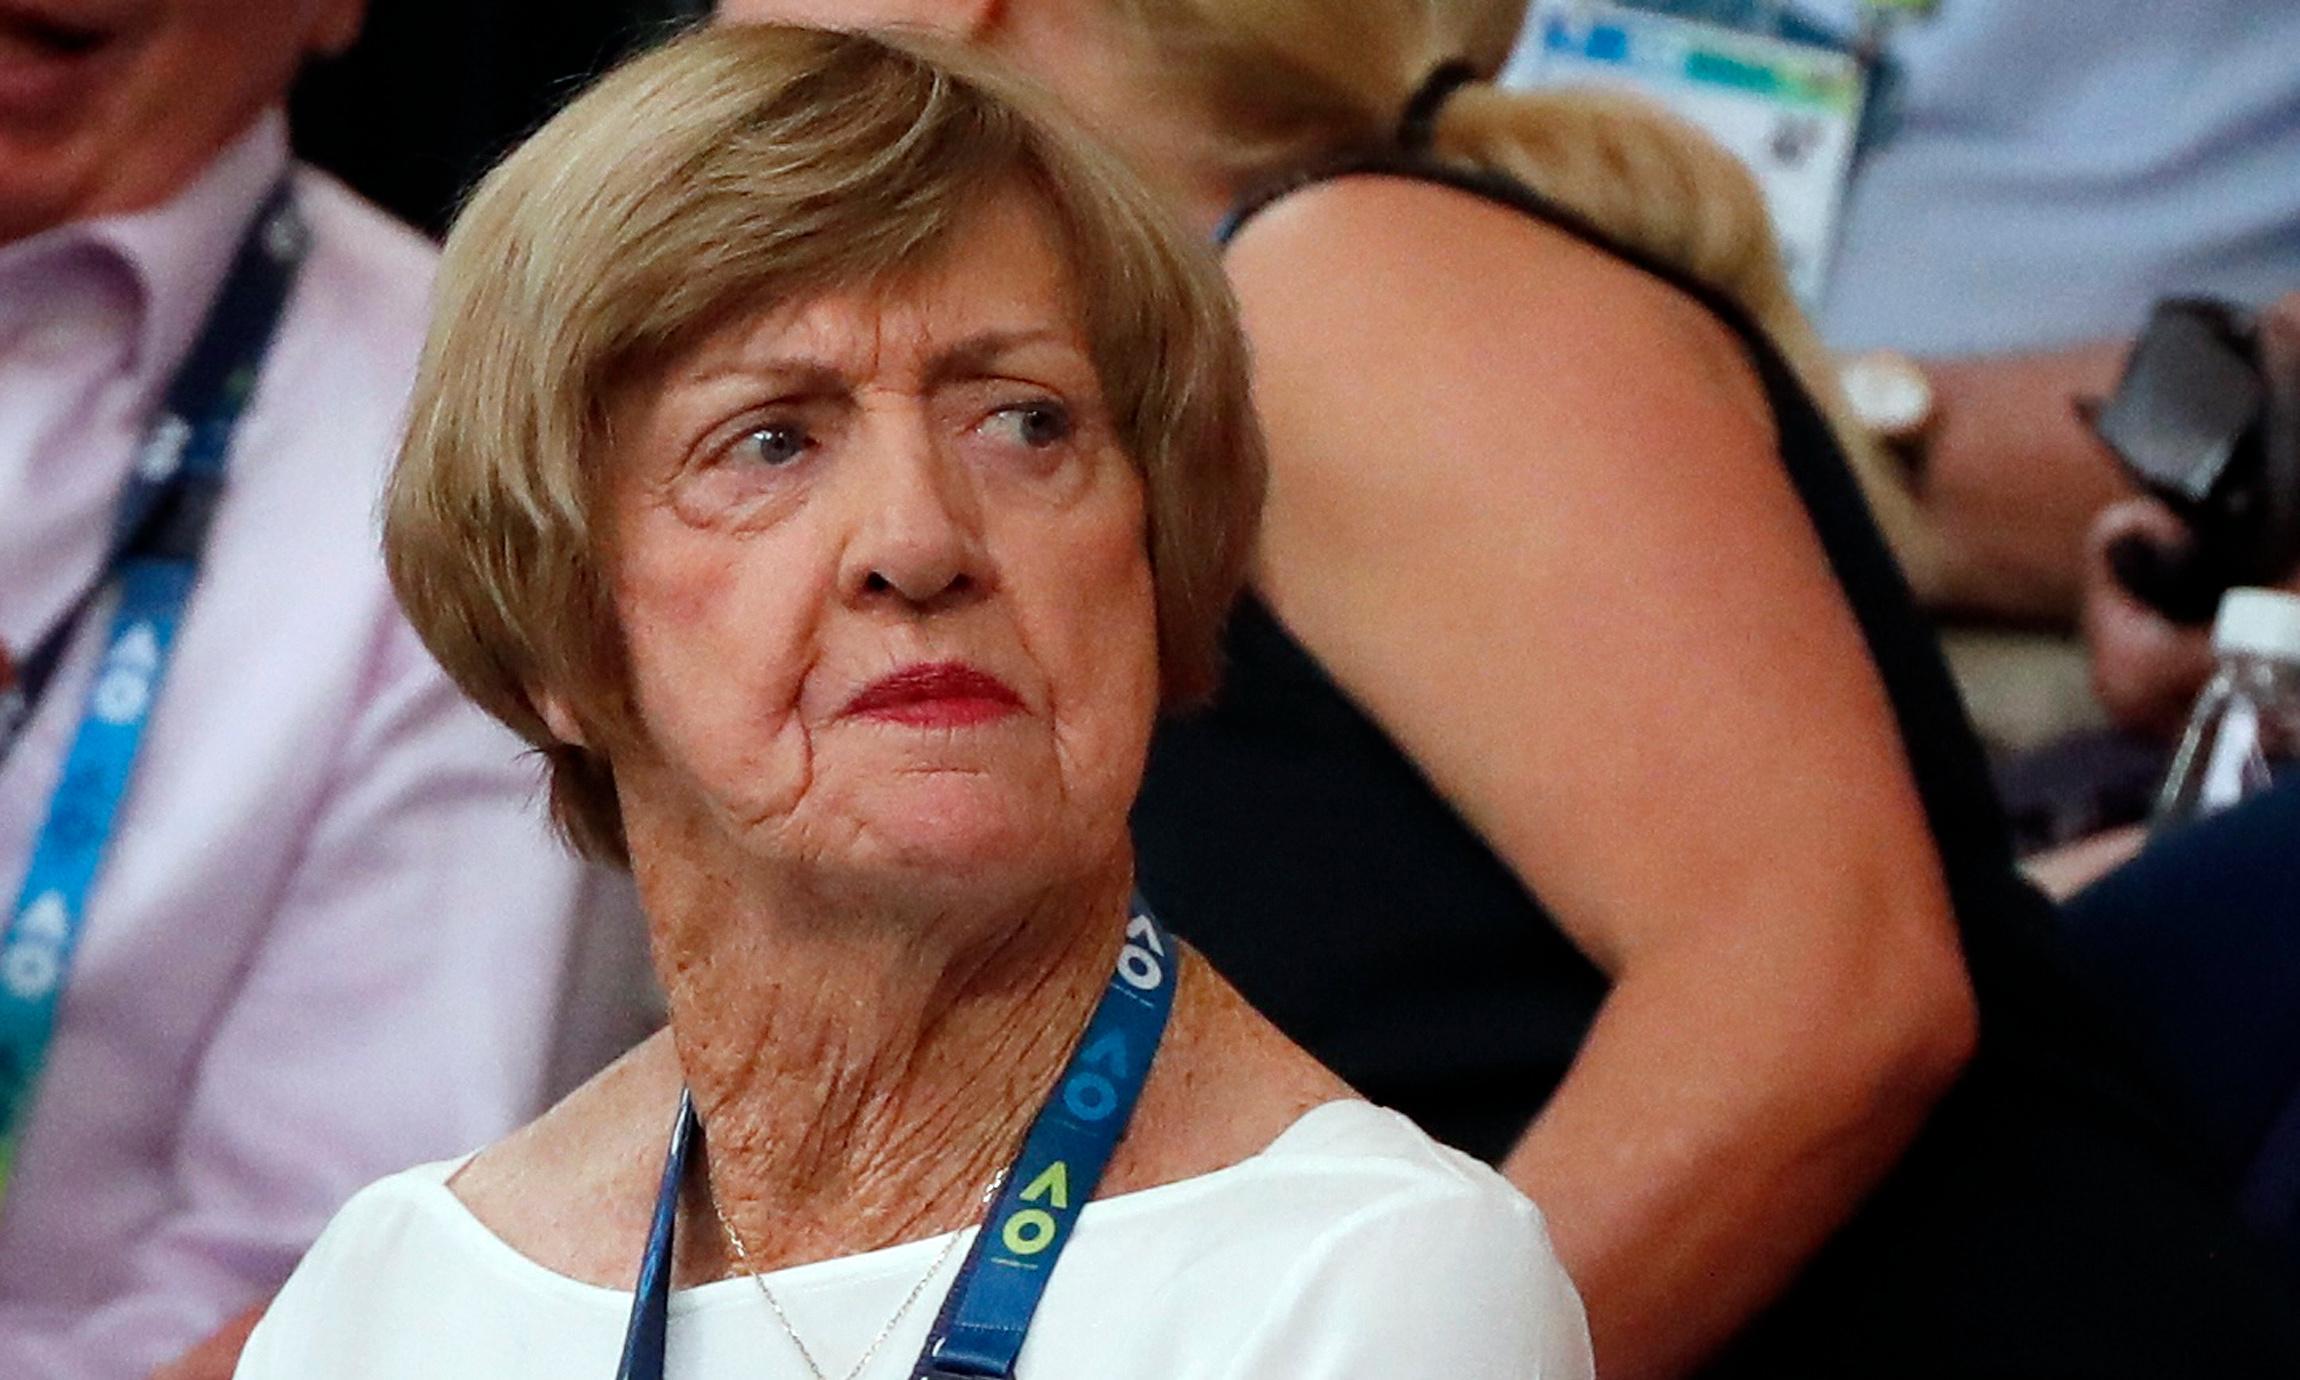 Margaret Court claims discrimination after treatment by Tennis Australia